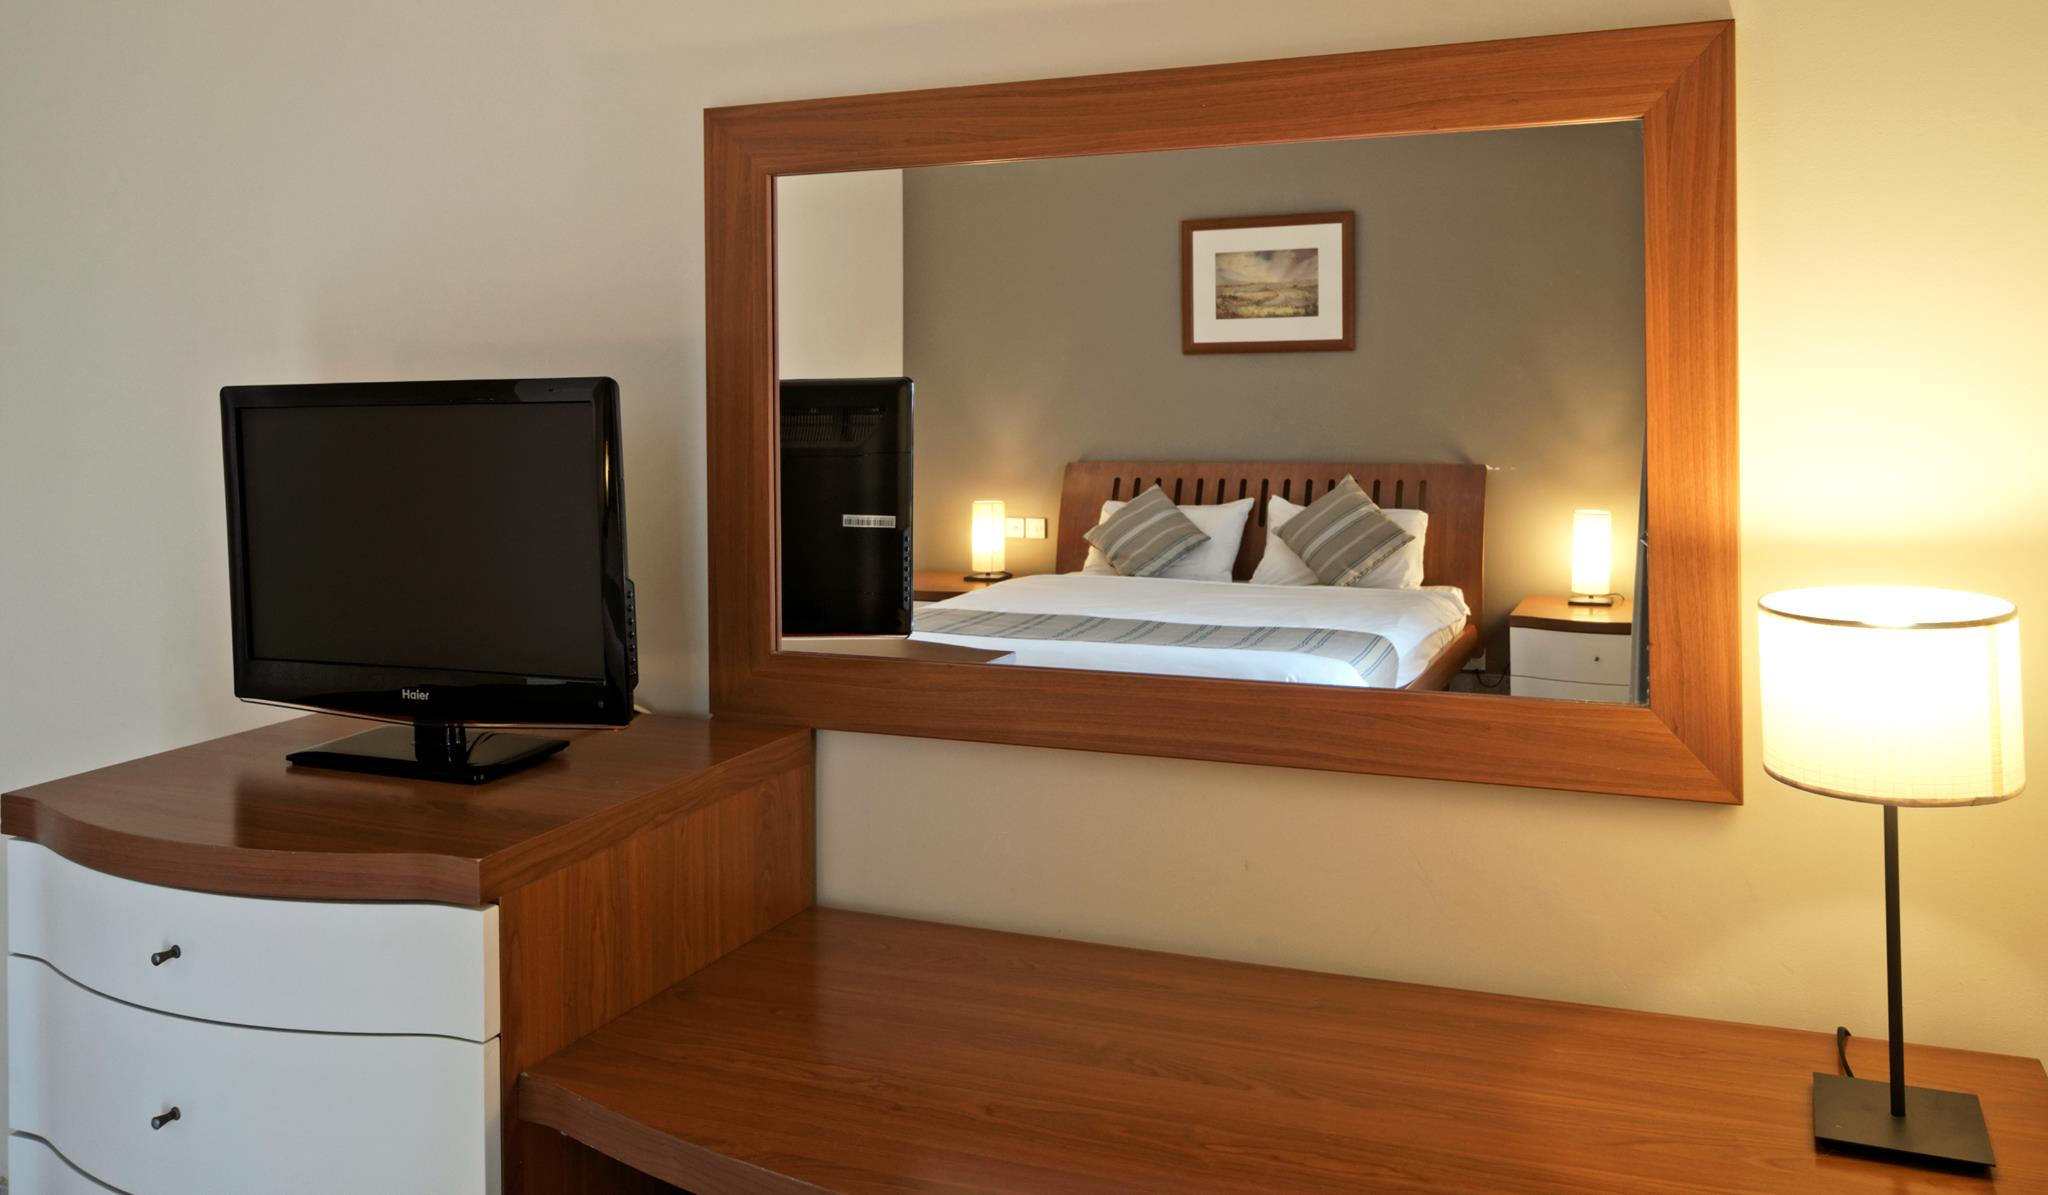 Aparthotel Malta Self Catering Bedroom Room